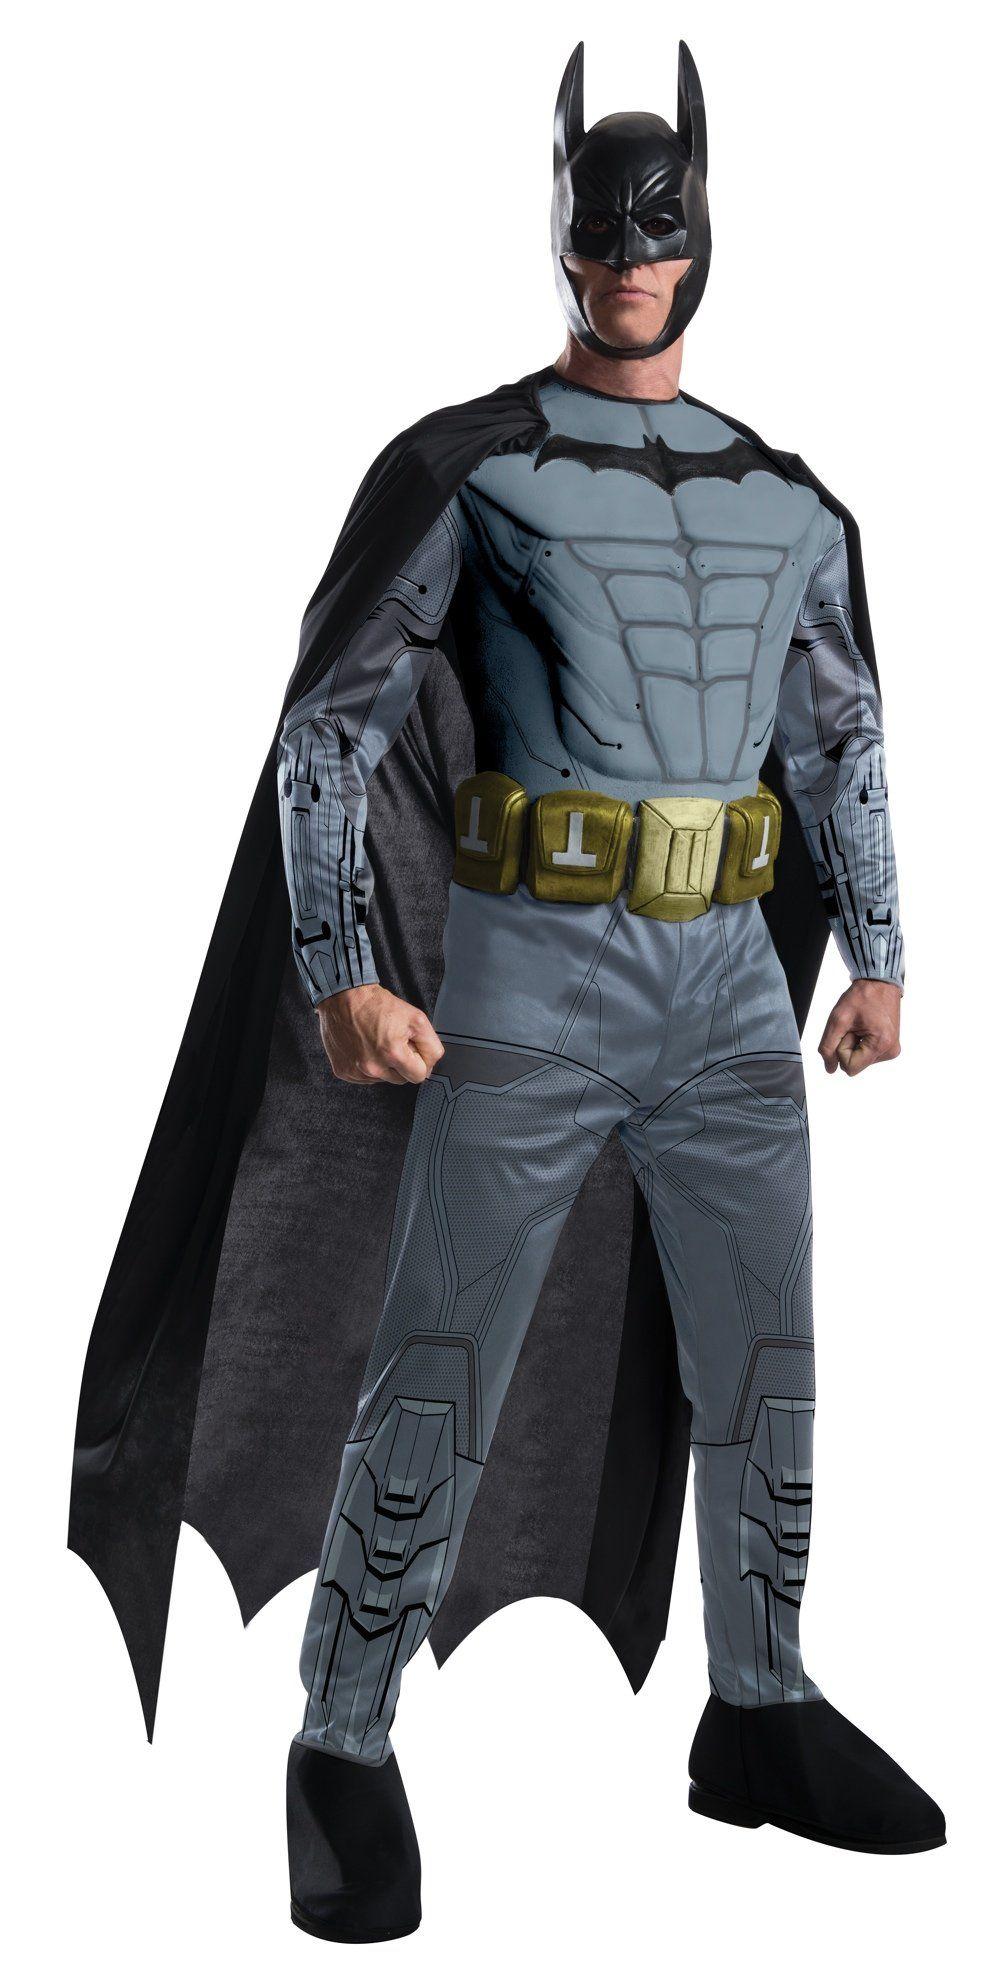 Batman DC Comics New Arkham Franchise Adult  Superhero Halloween Costume